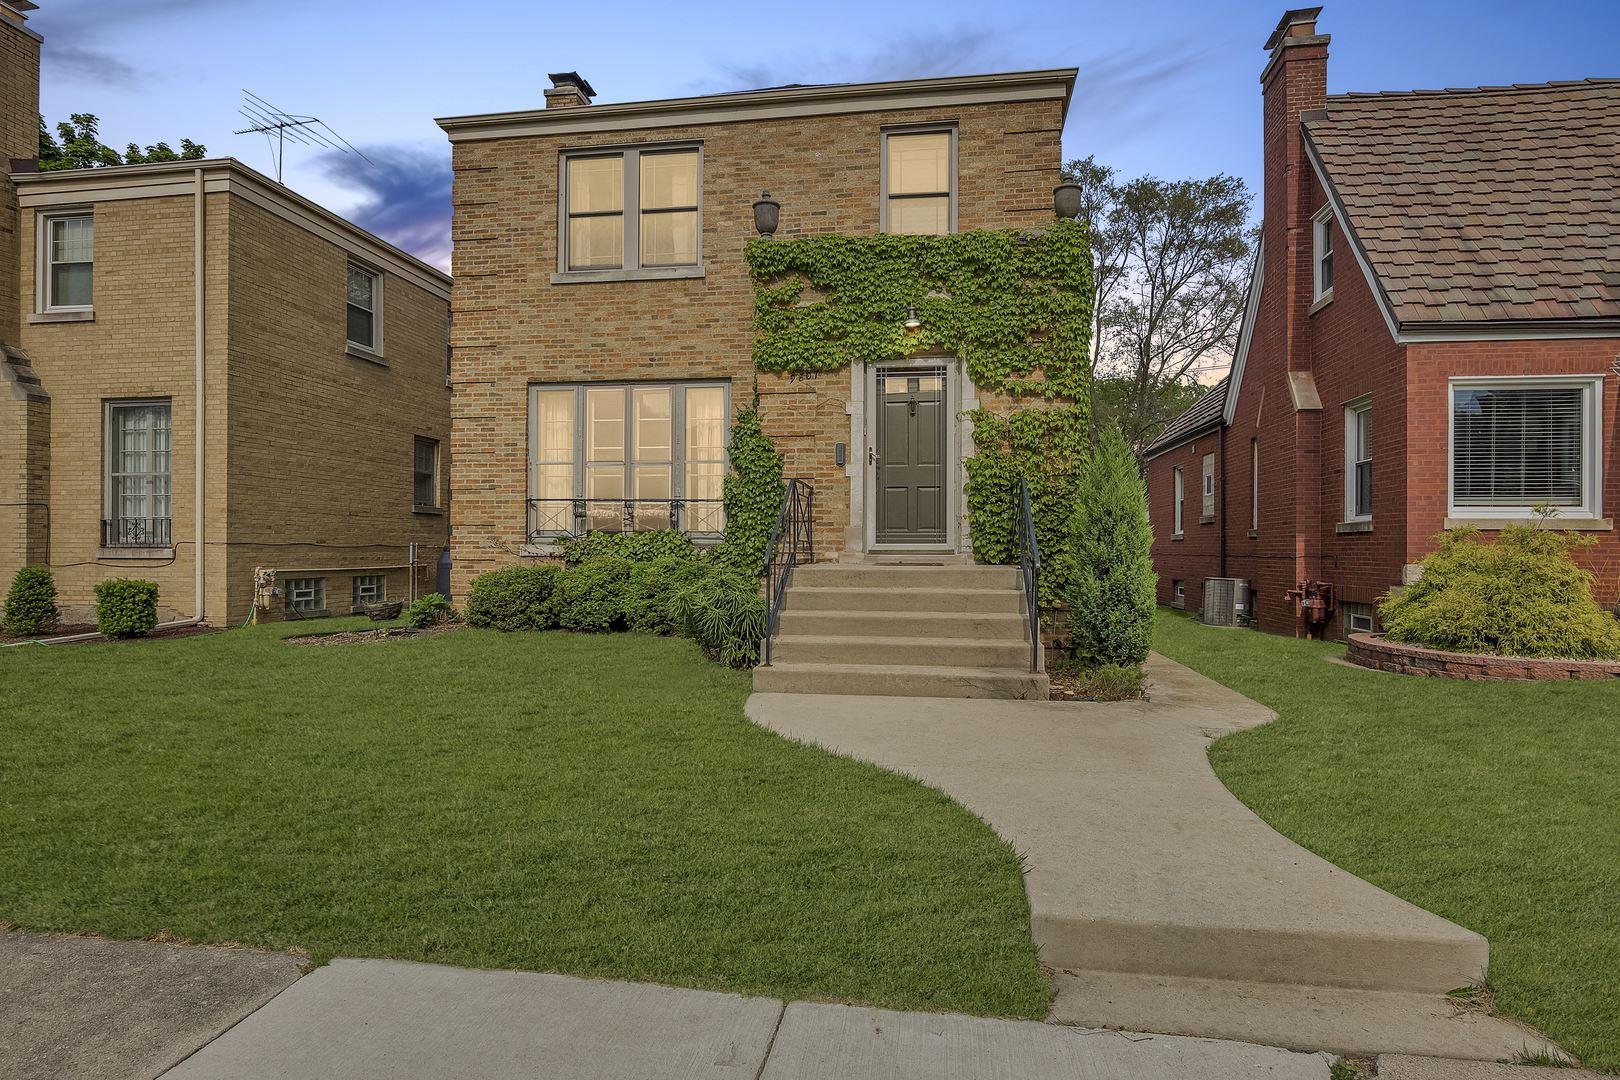 9807 S Hoyne Avenue, Chicago, IL 60643 - #: 10739445